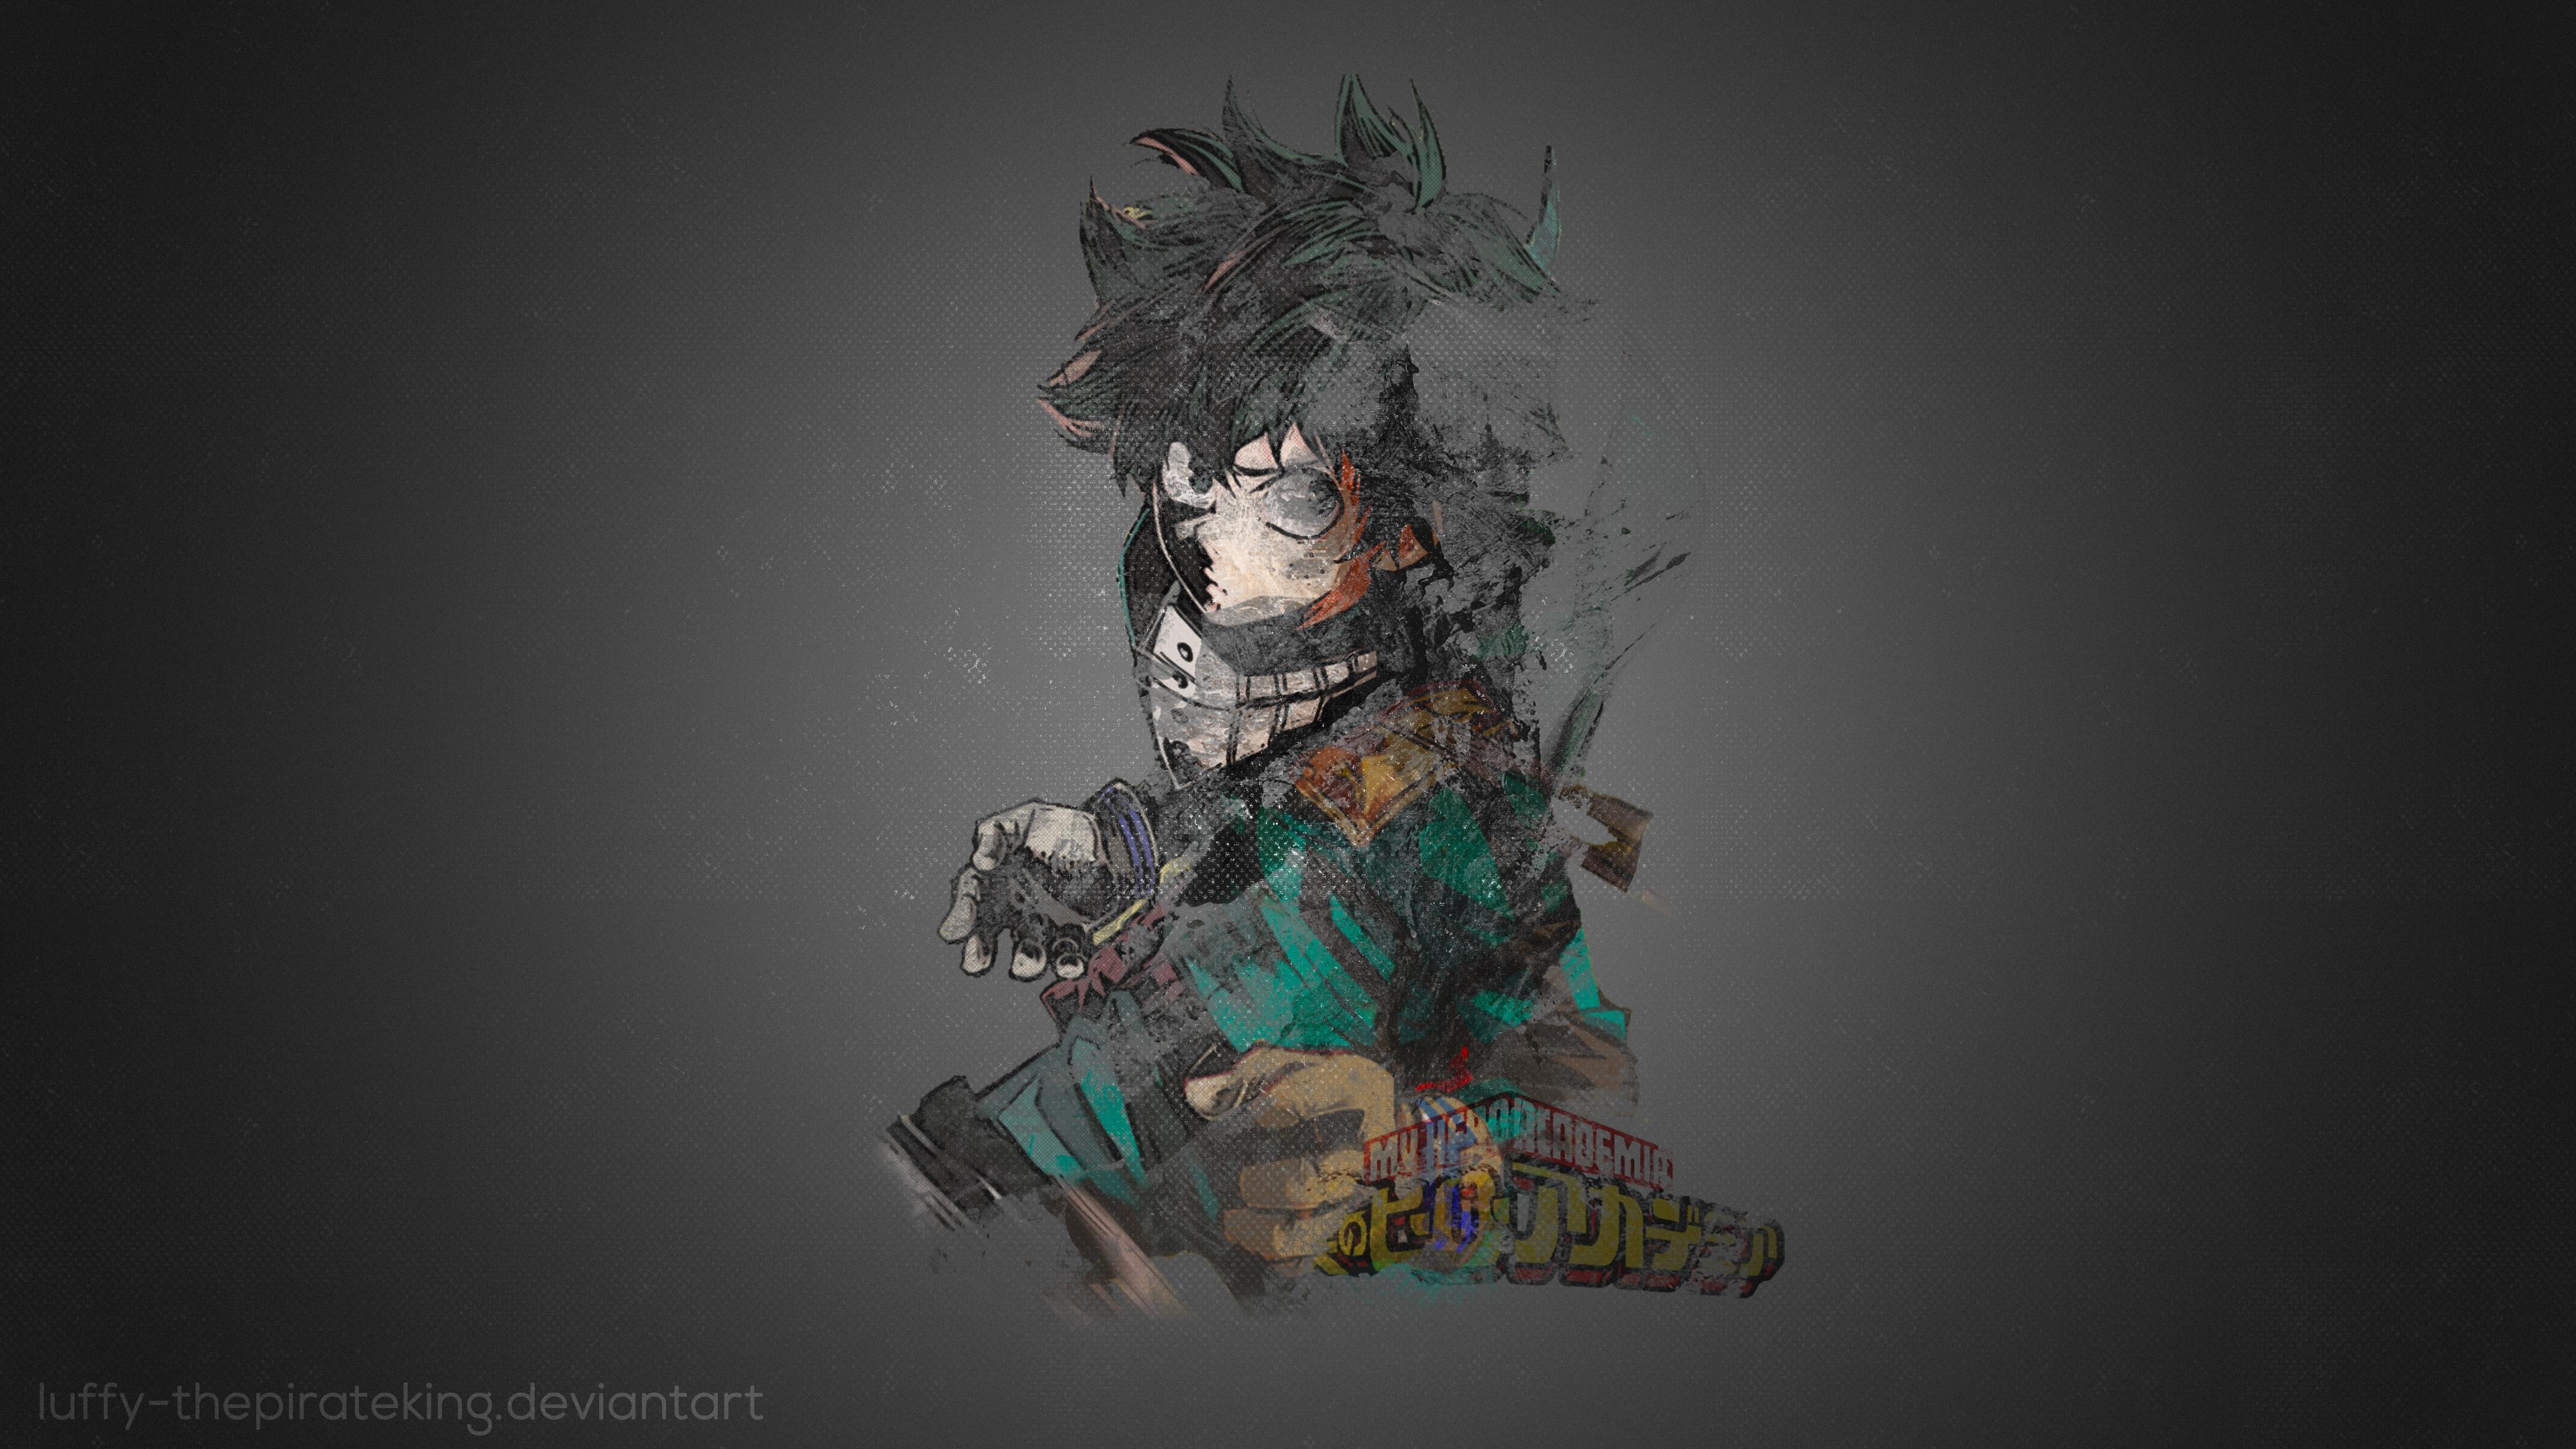 My Hero Academia 4k Ultra Hd Wallpaper Background Image